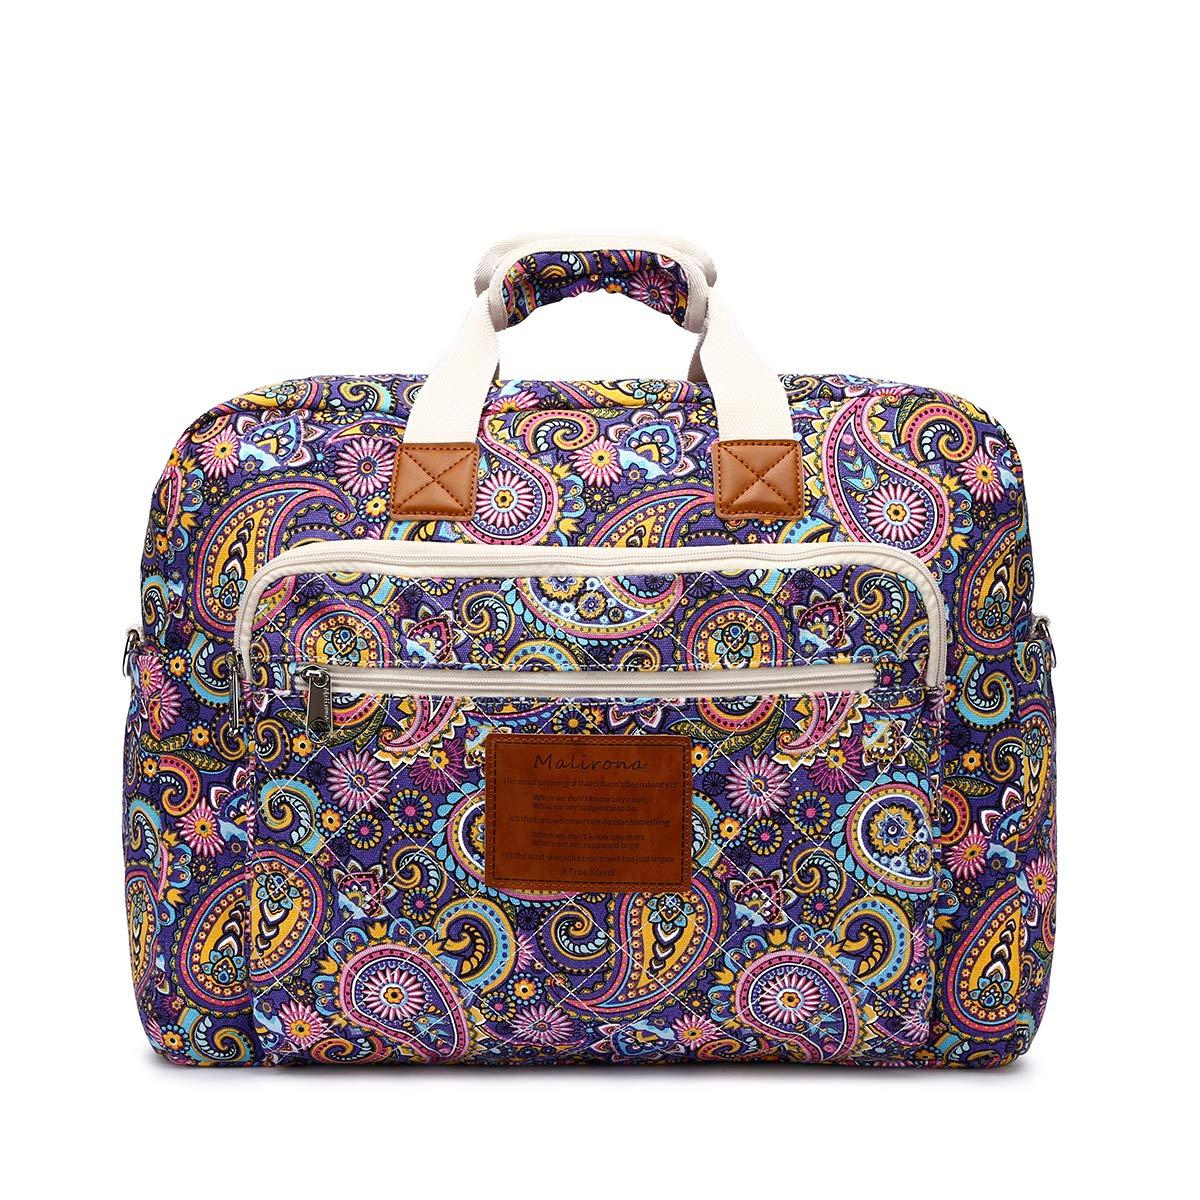 Malirona Women's Canvas Overnight Weekender Bag Carry On Travel Duffel Tote Bag Bohemian Flower (Purple Flower)